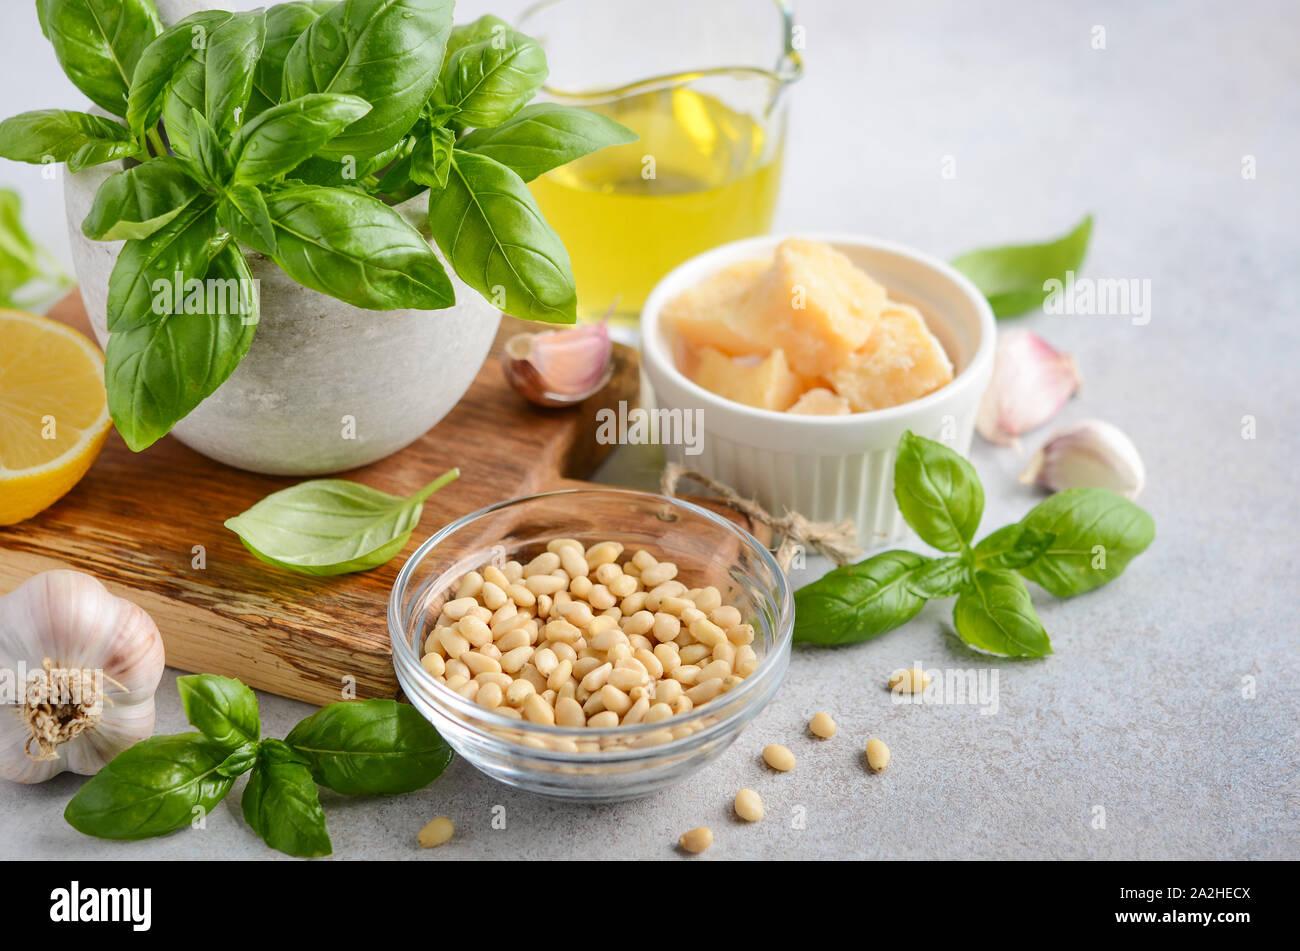 Ingredients for making green pesto sauce. Stock Photo